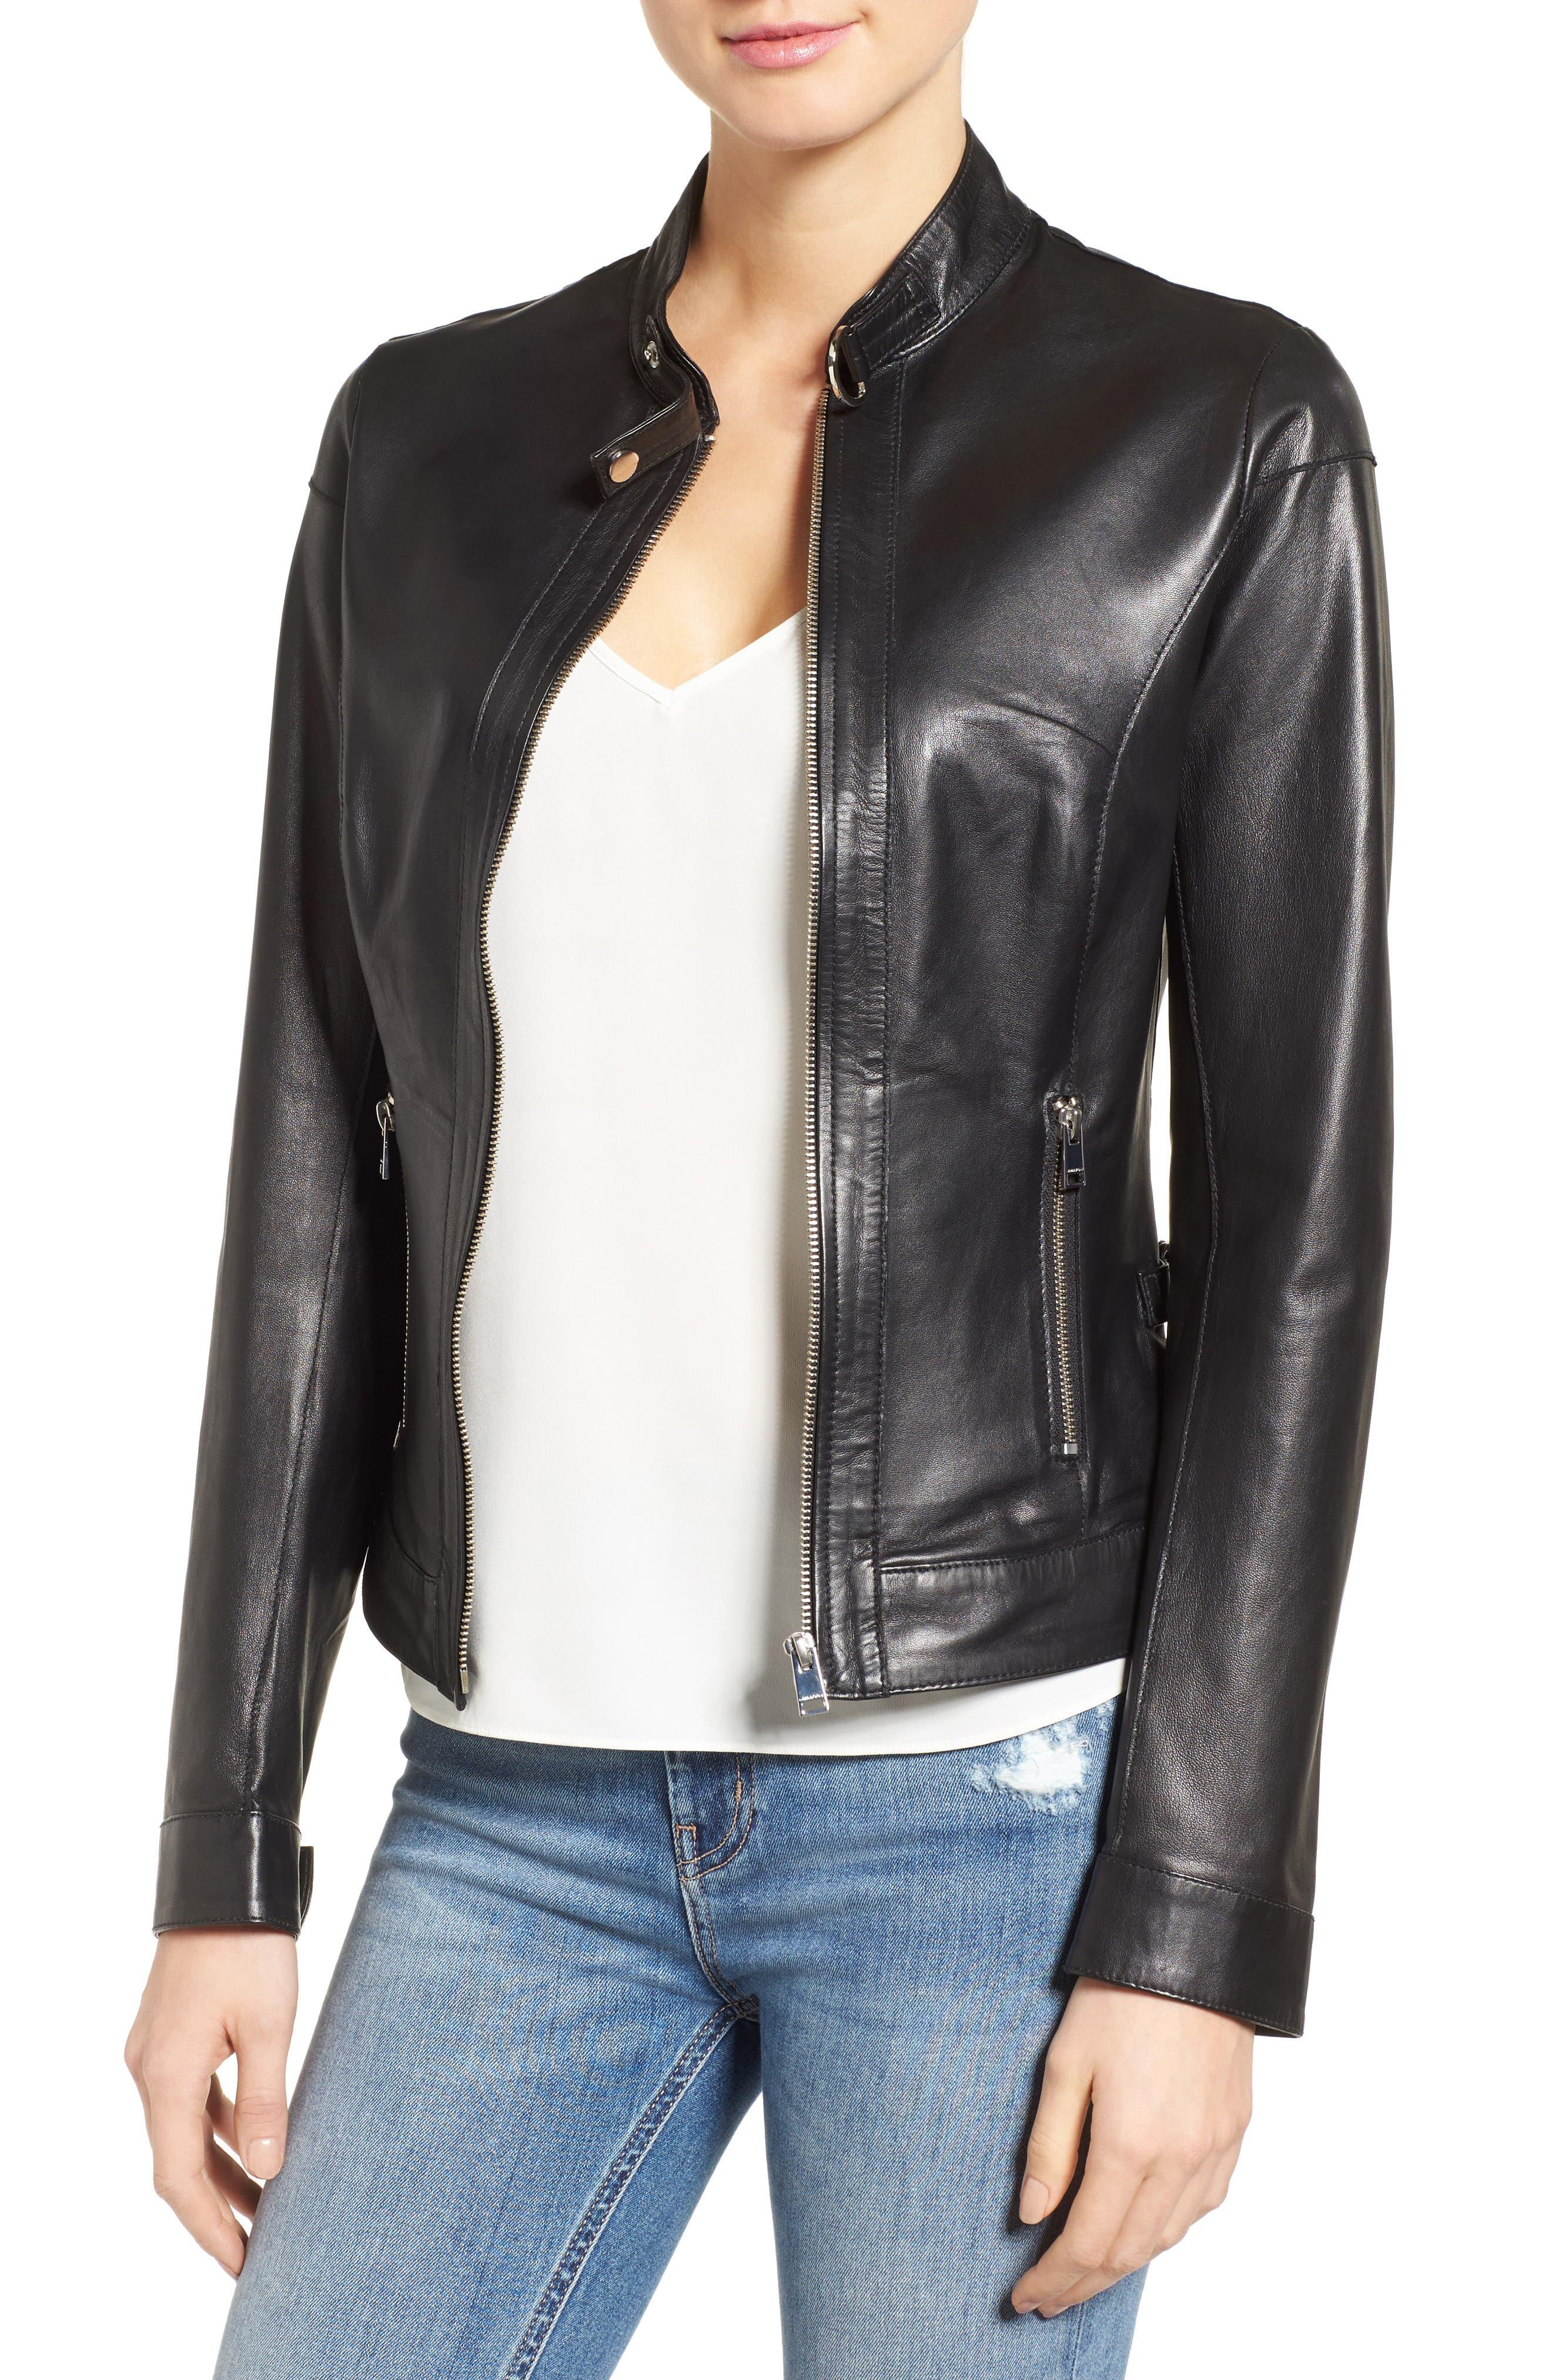 Alternate Image 1 Selected - LAMARQUE Lambskin Leather Biker Jacket